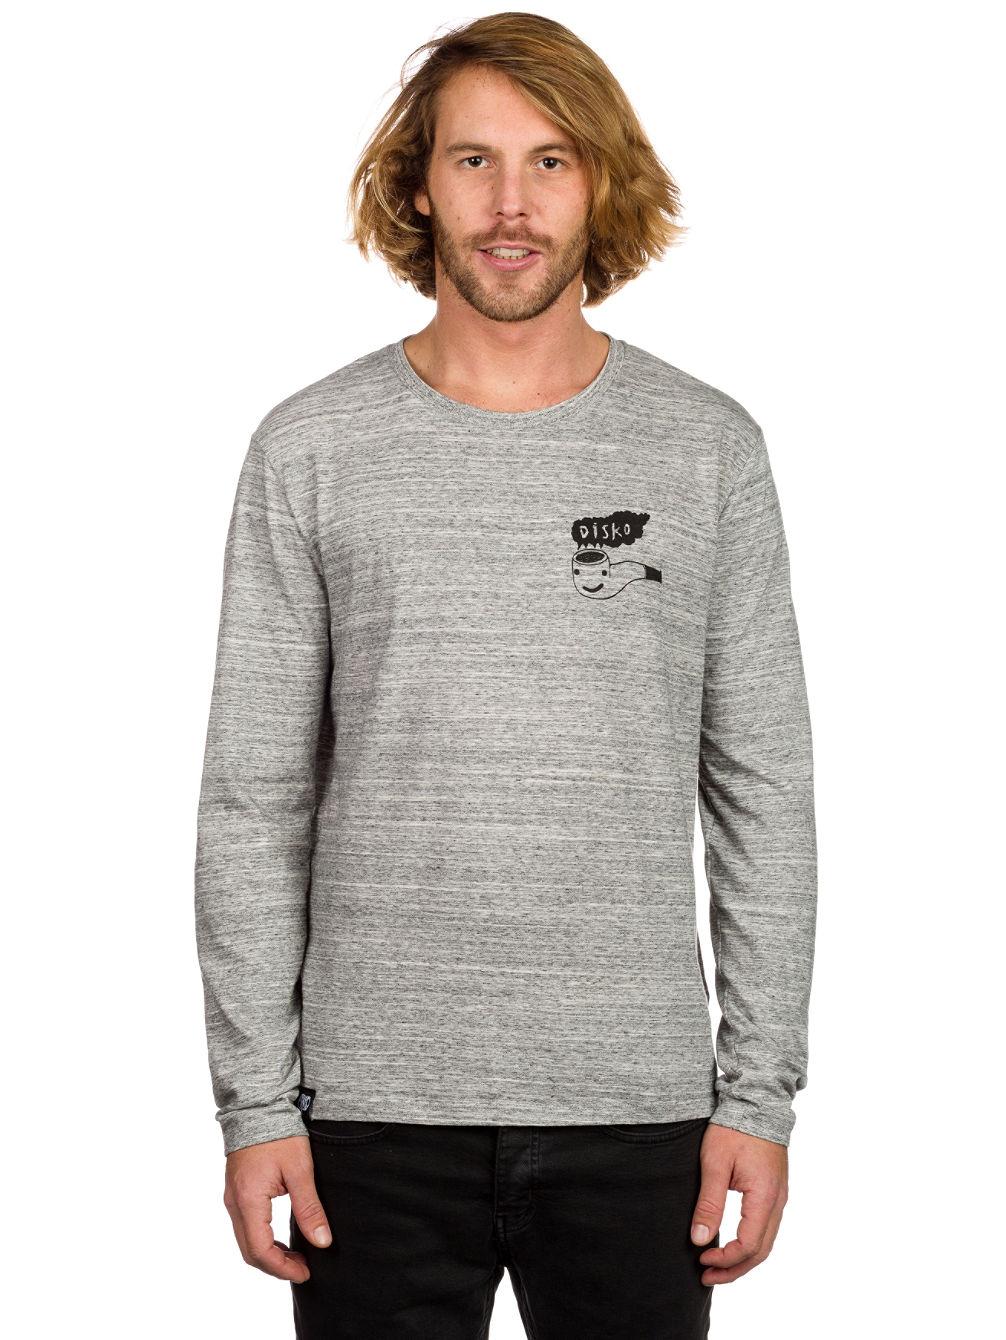 disko-tobak-shirt-ls